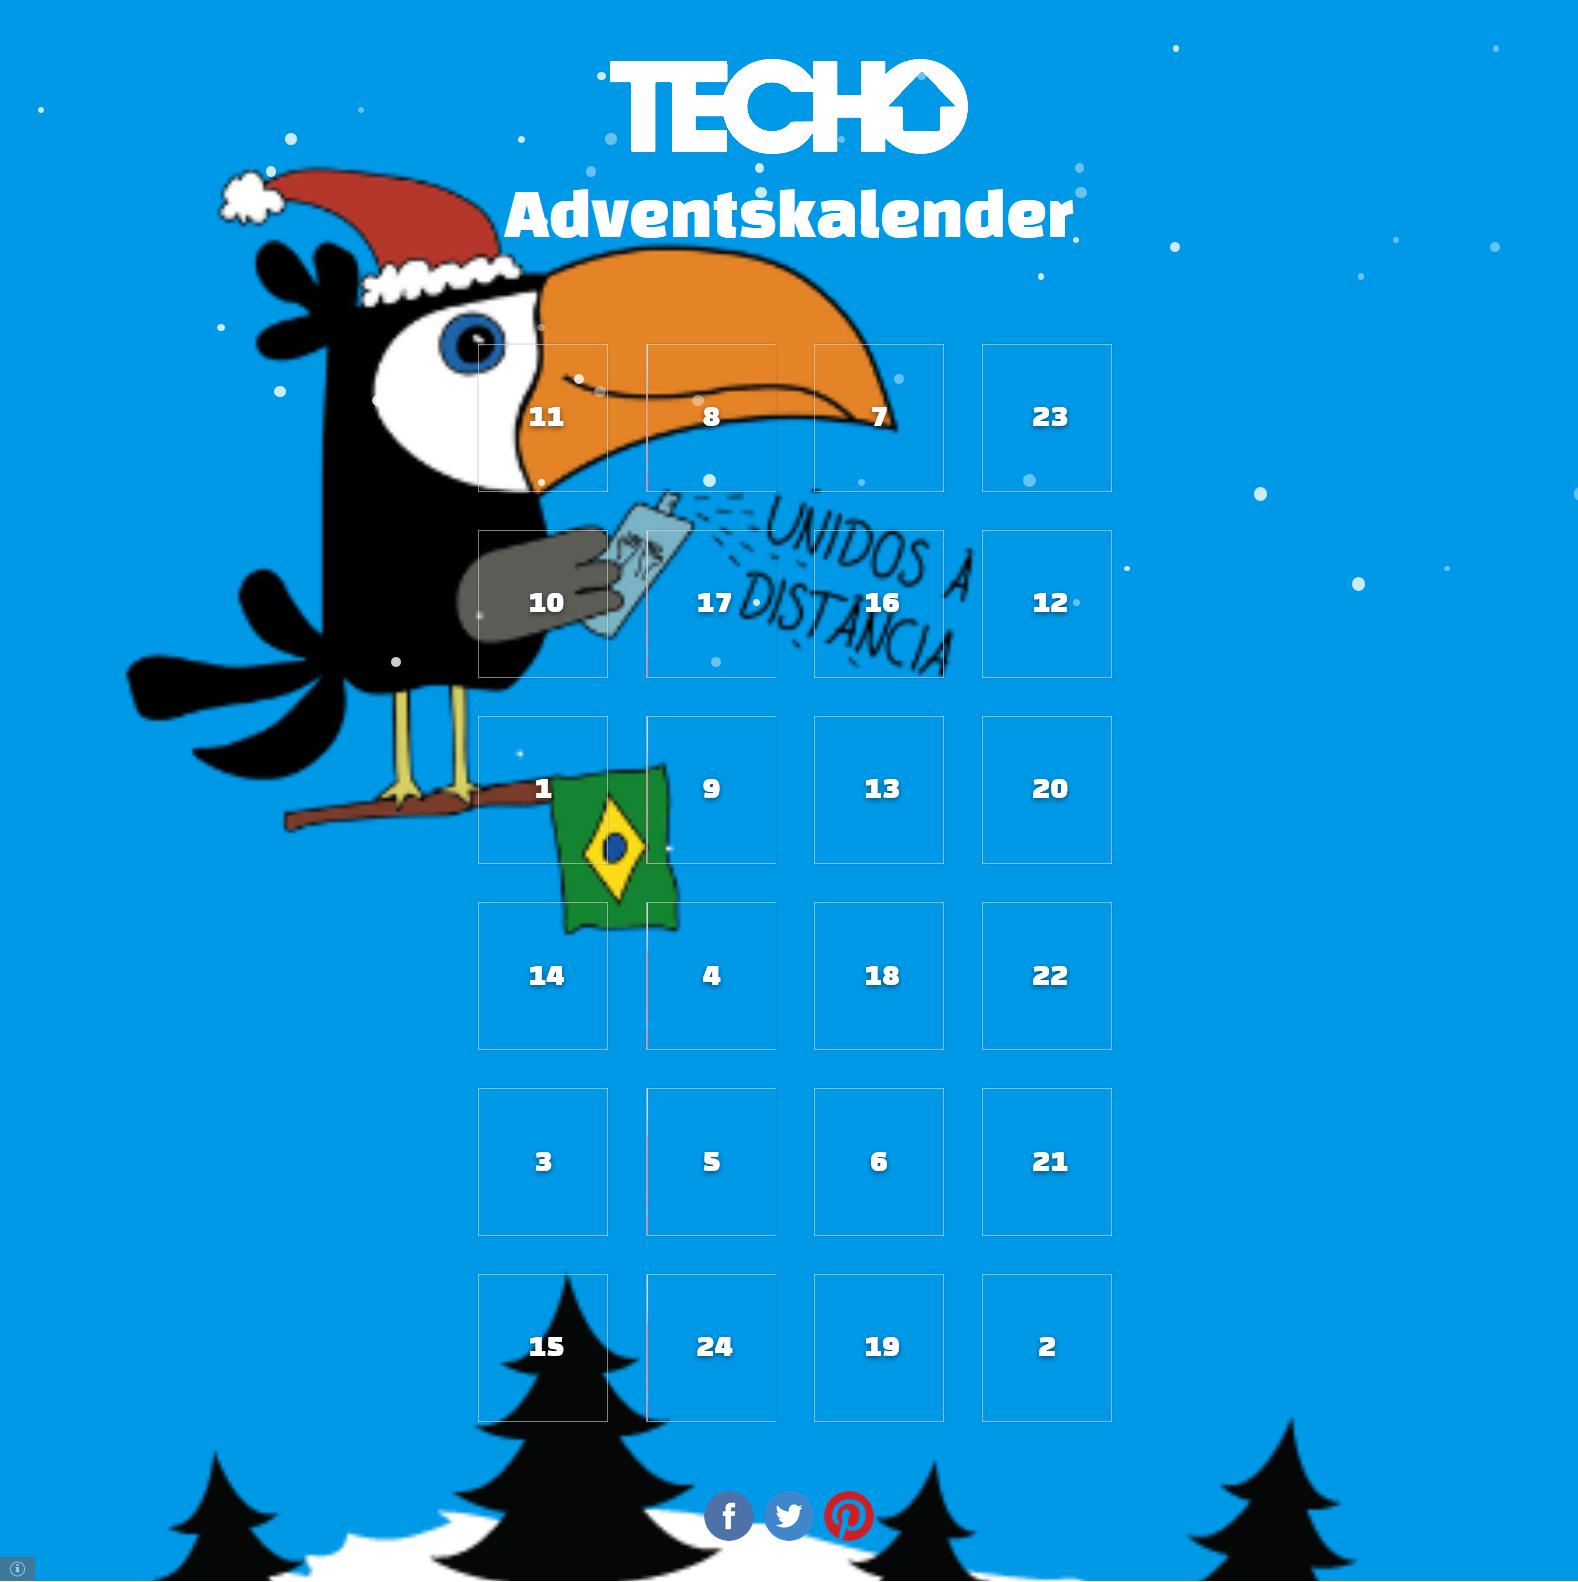 Techo_Adventskalender